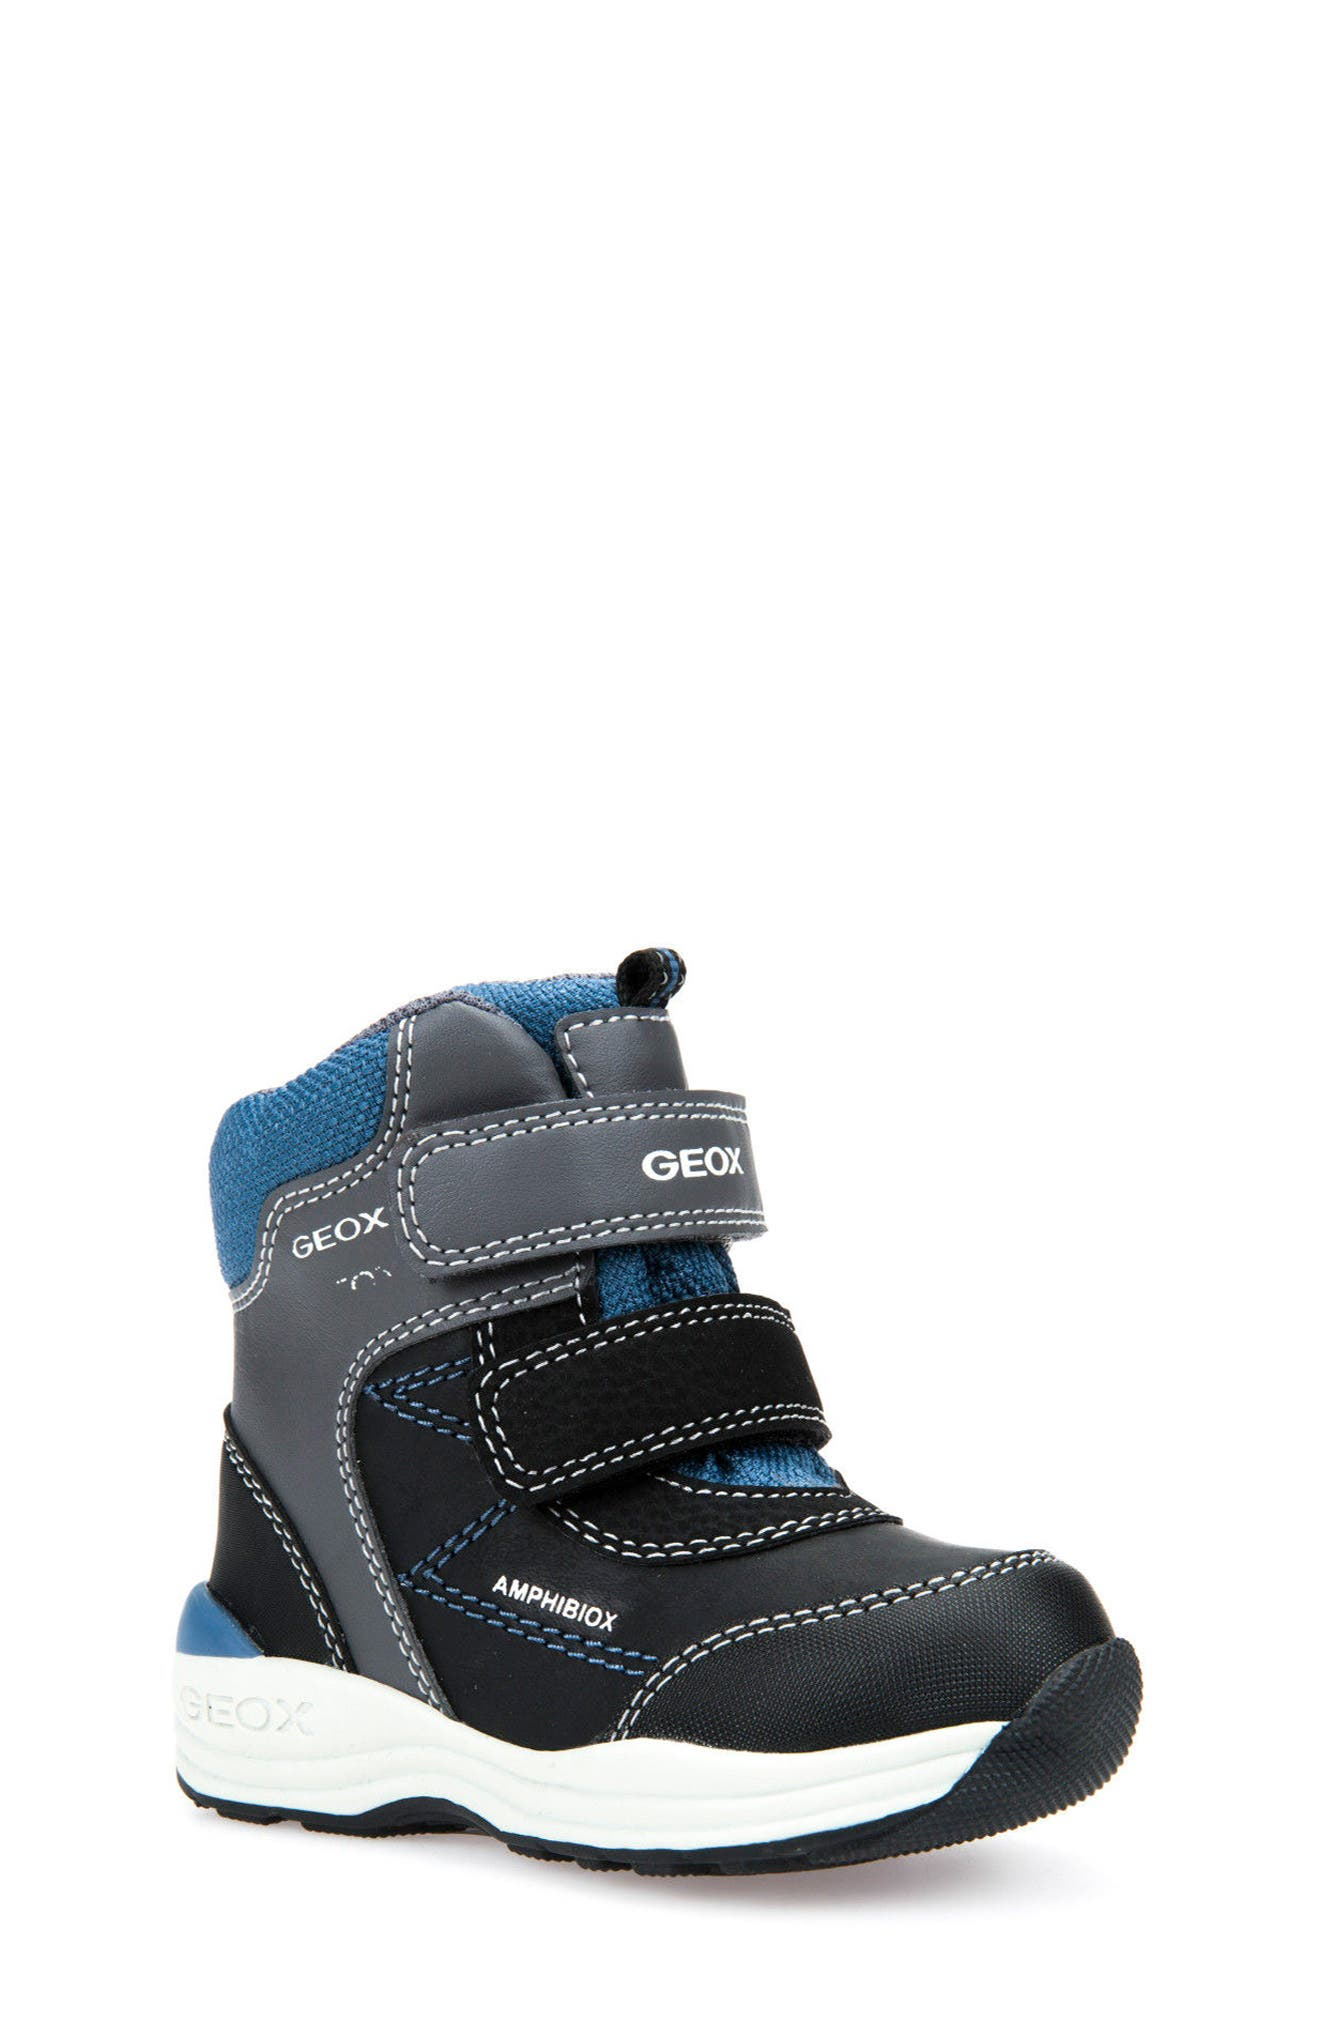 Gulp ABX Waterproof Boot,                             Main thumbnail 1, color,                             Dark Grey/ Avio